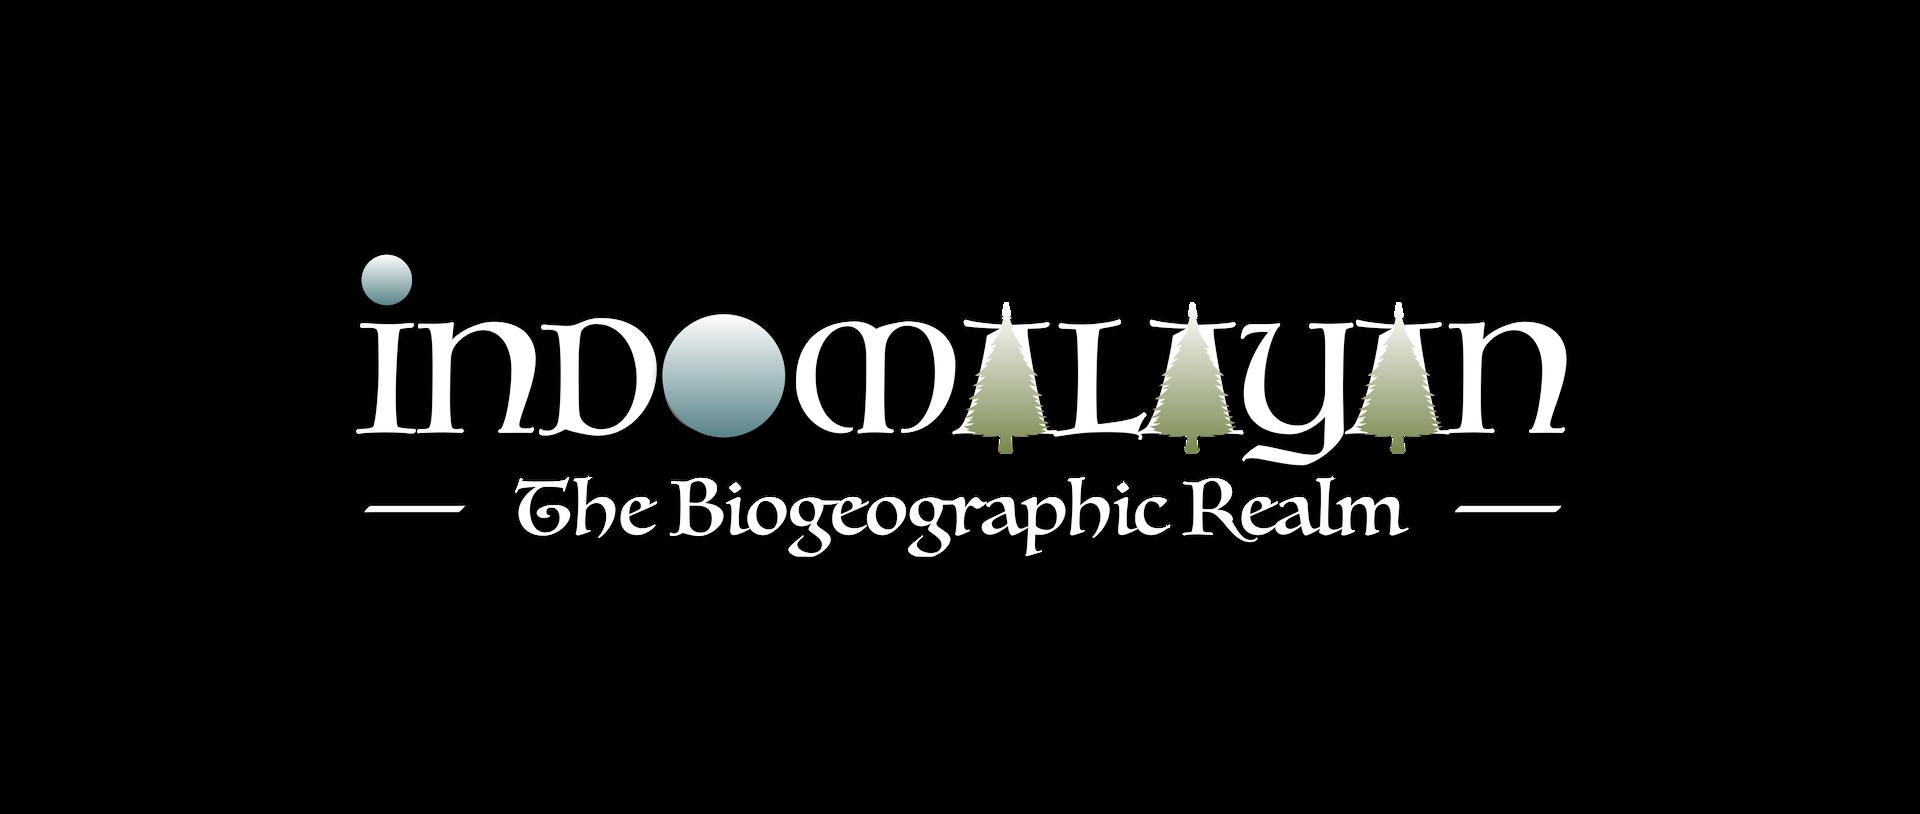 Indomalayan Diaries - 1st titles.002.png